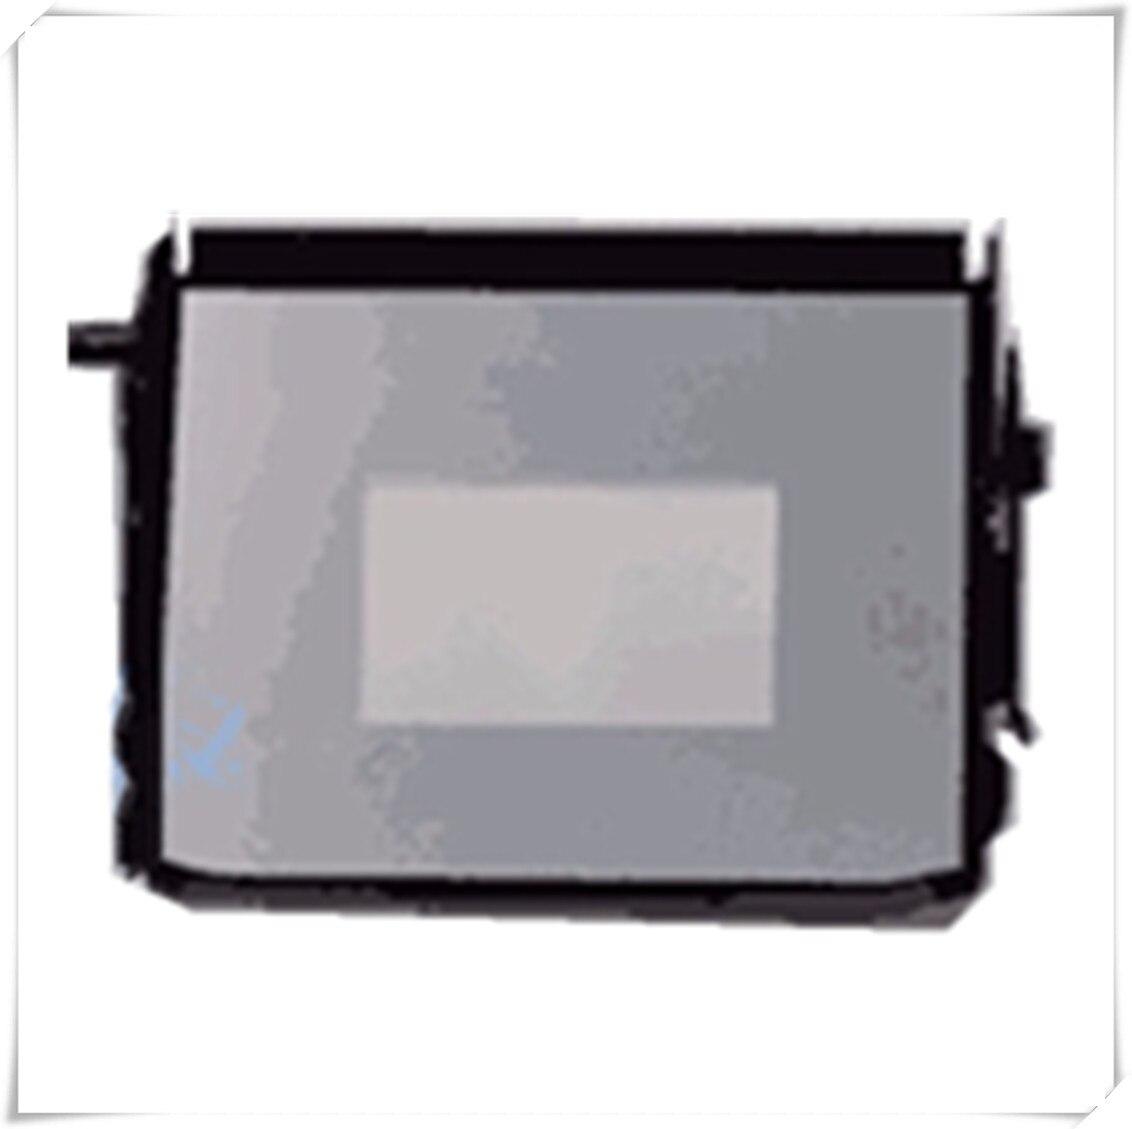 SLR digital camera repair replacement parts D3 Remarks model reflection mirror / reflective panels for Nikon